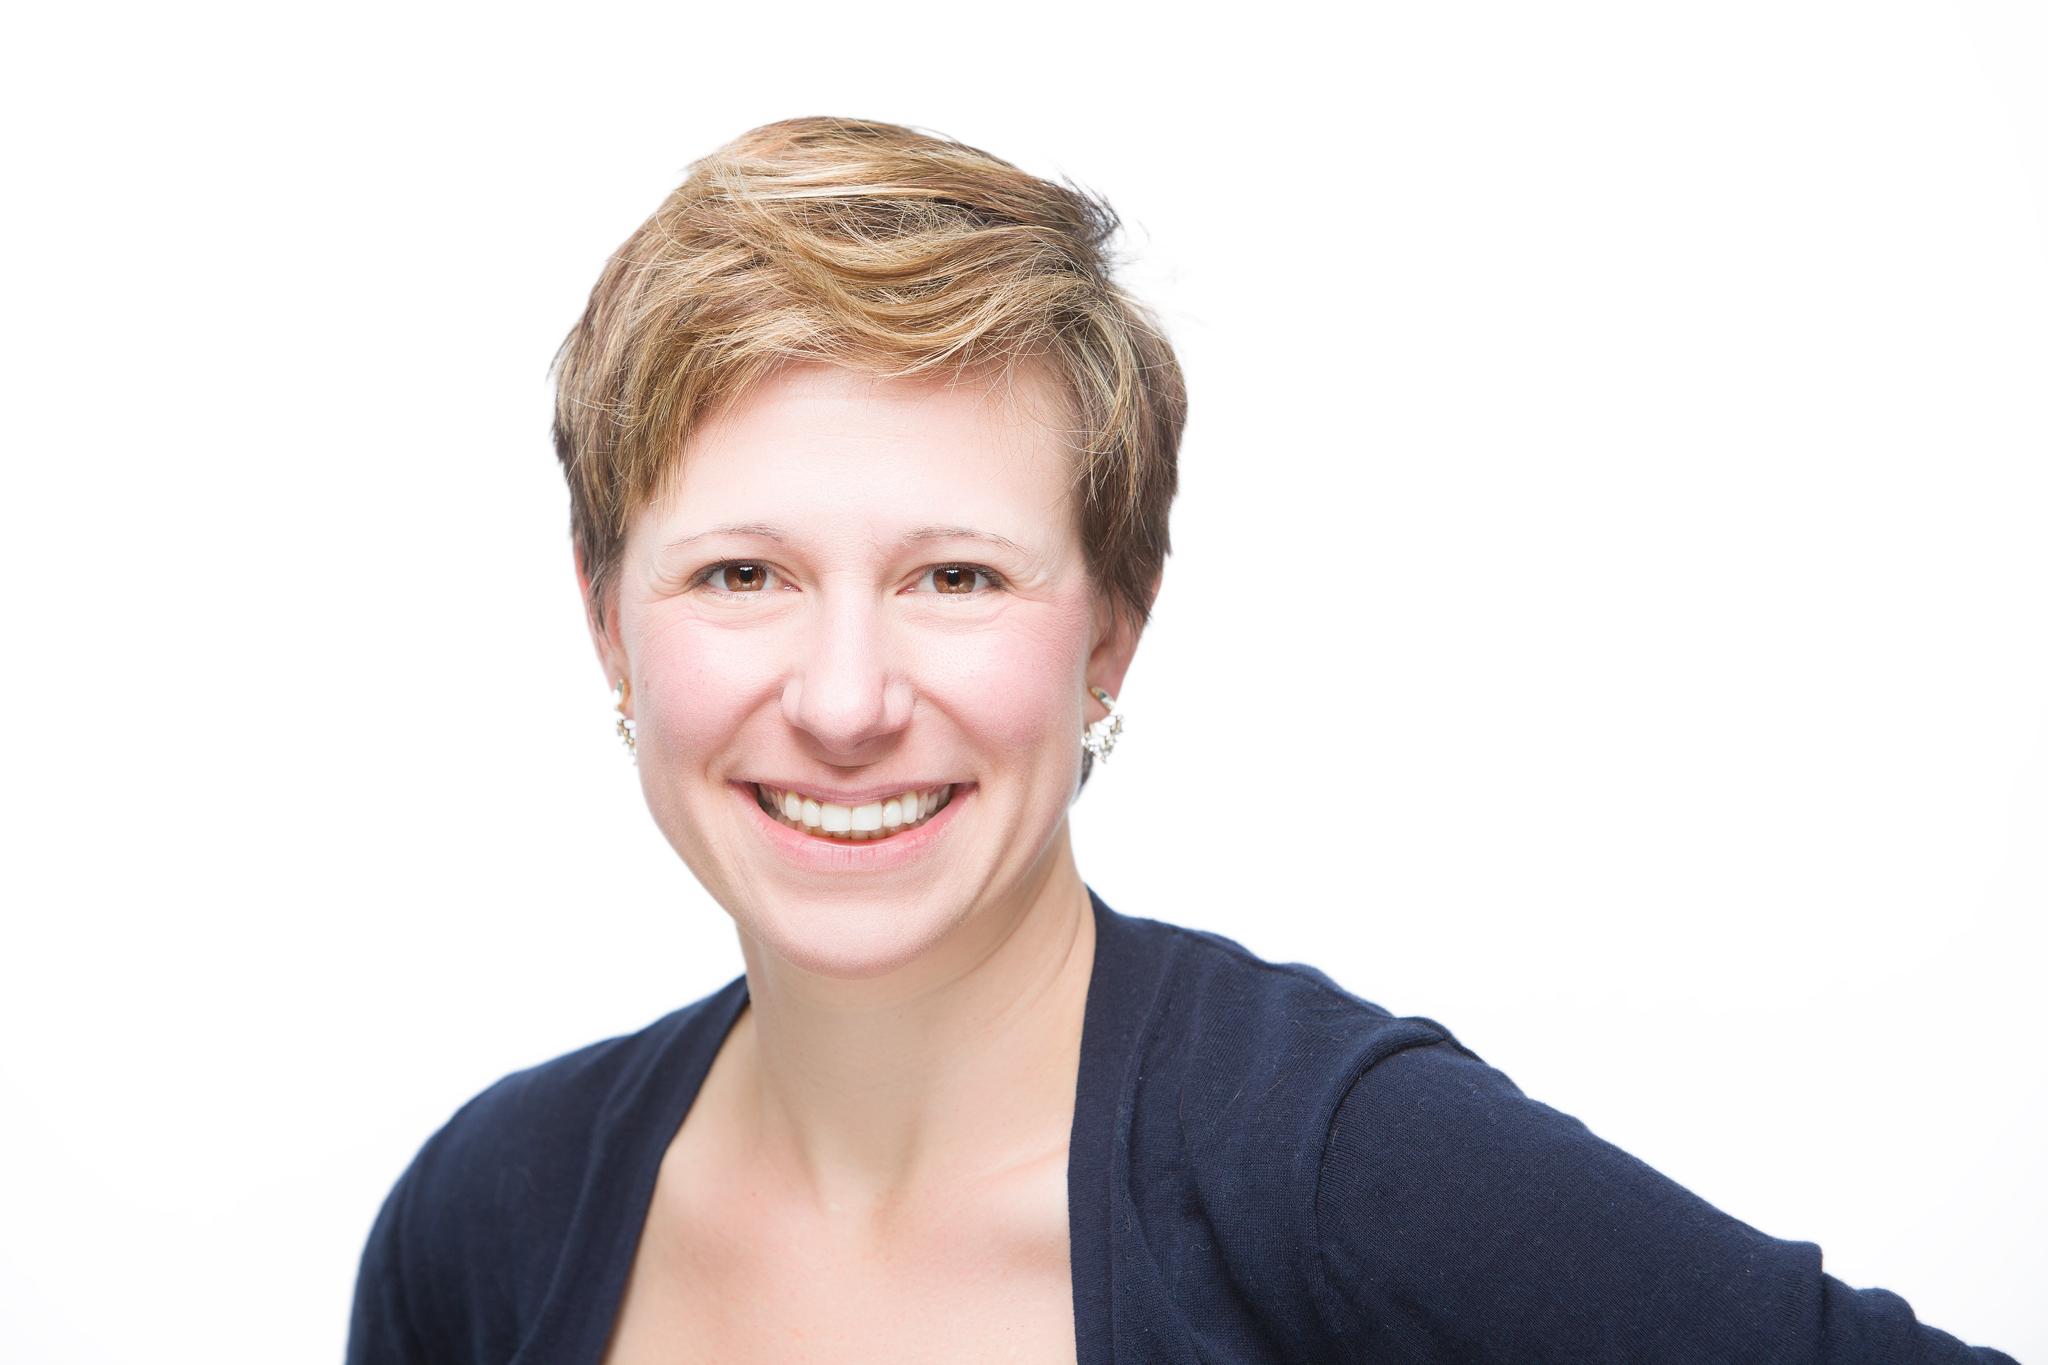 Rachel Bicking - Senior Vice President of Data and Analytics